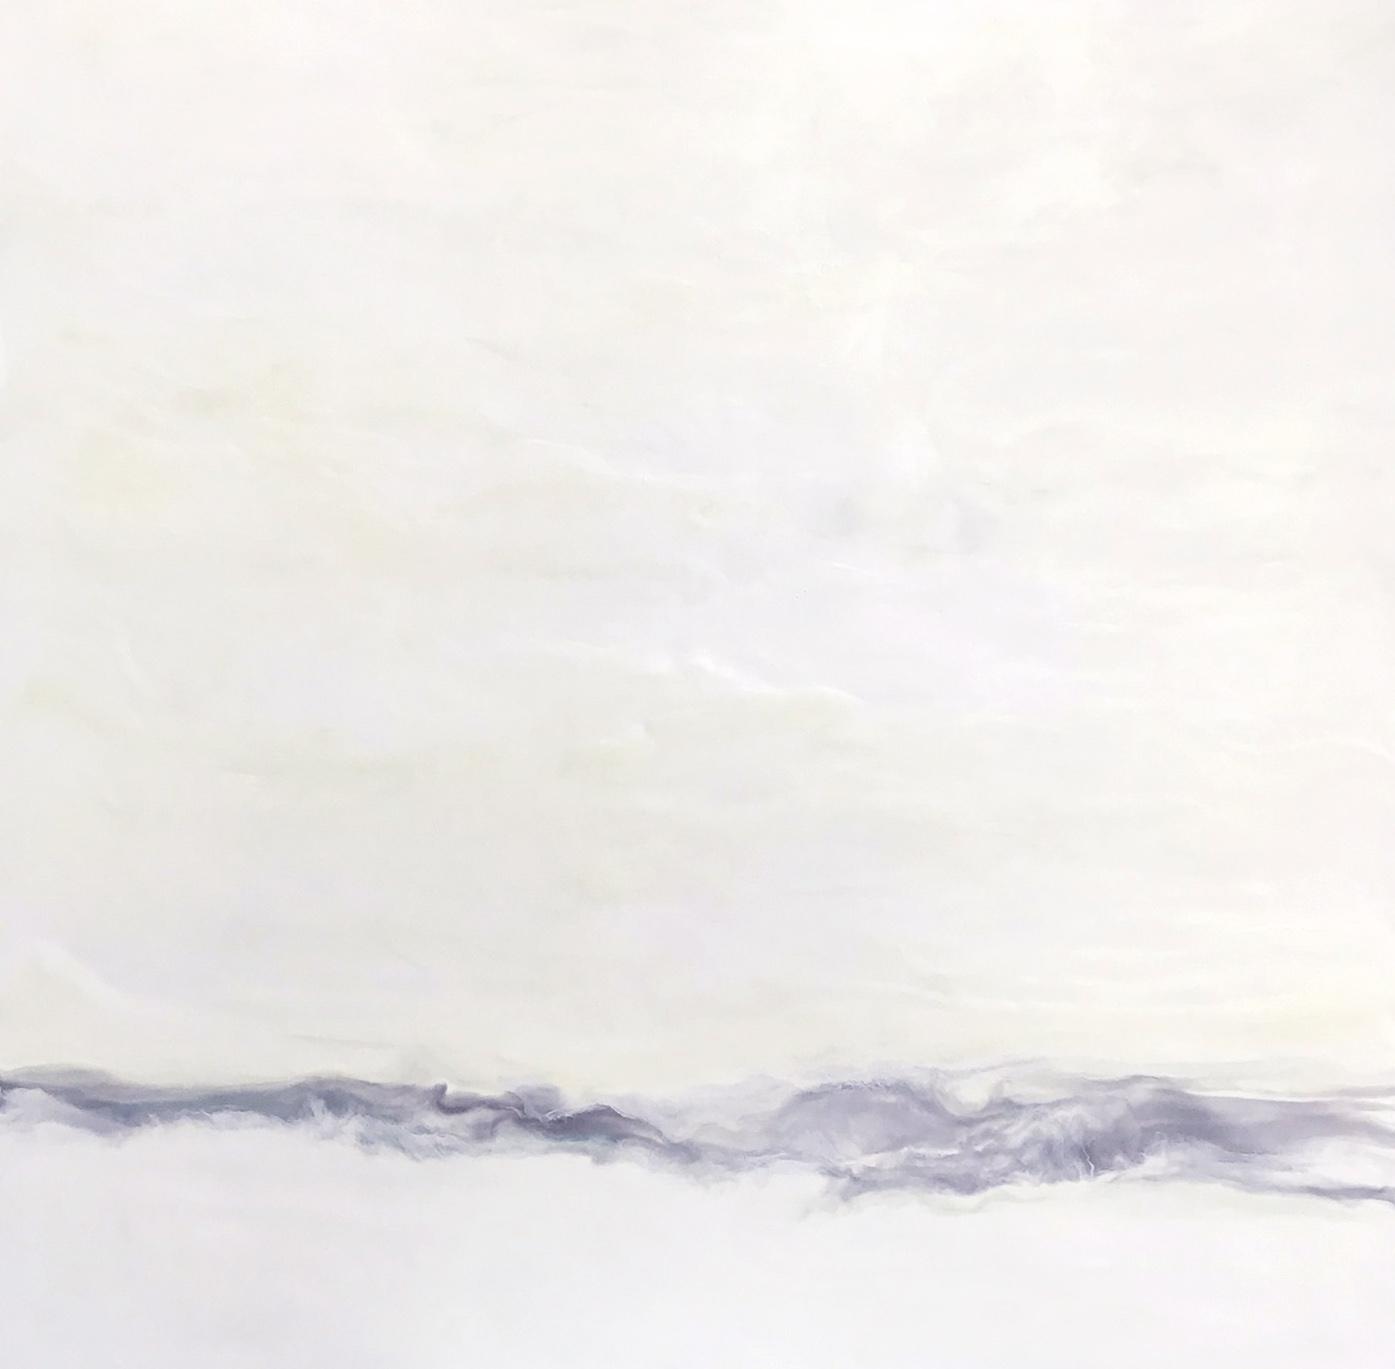 Currents — Erin Rigney